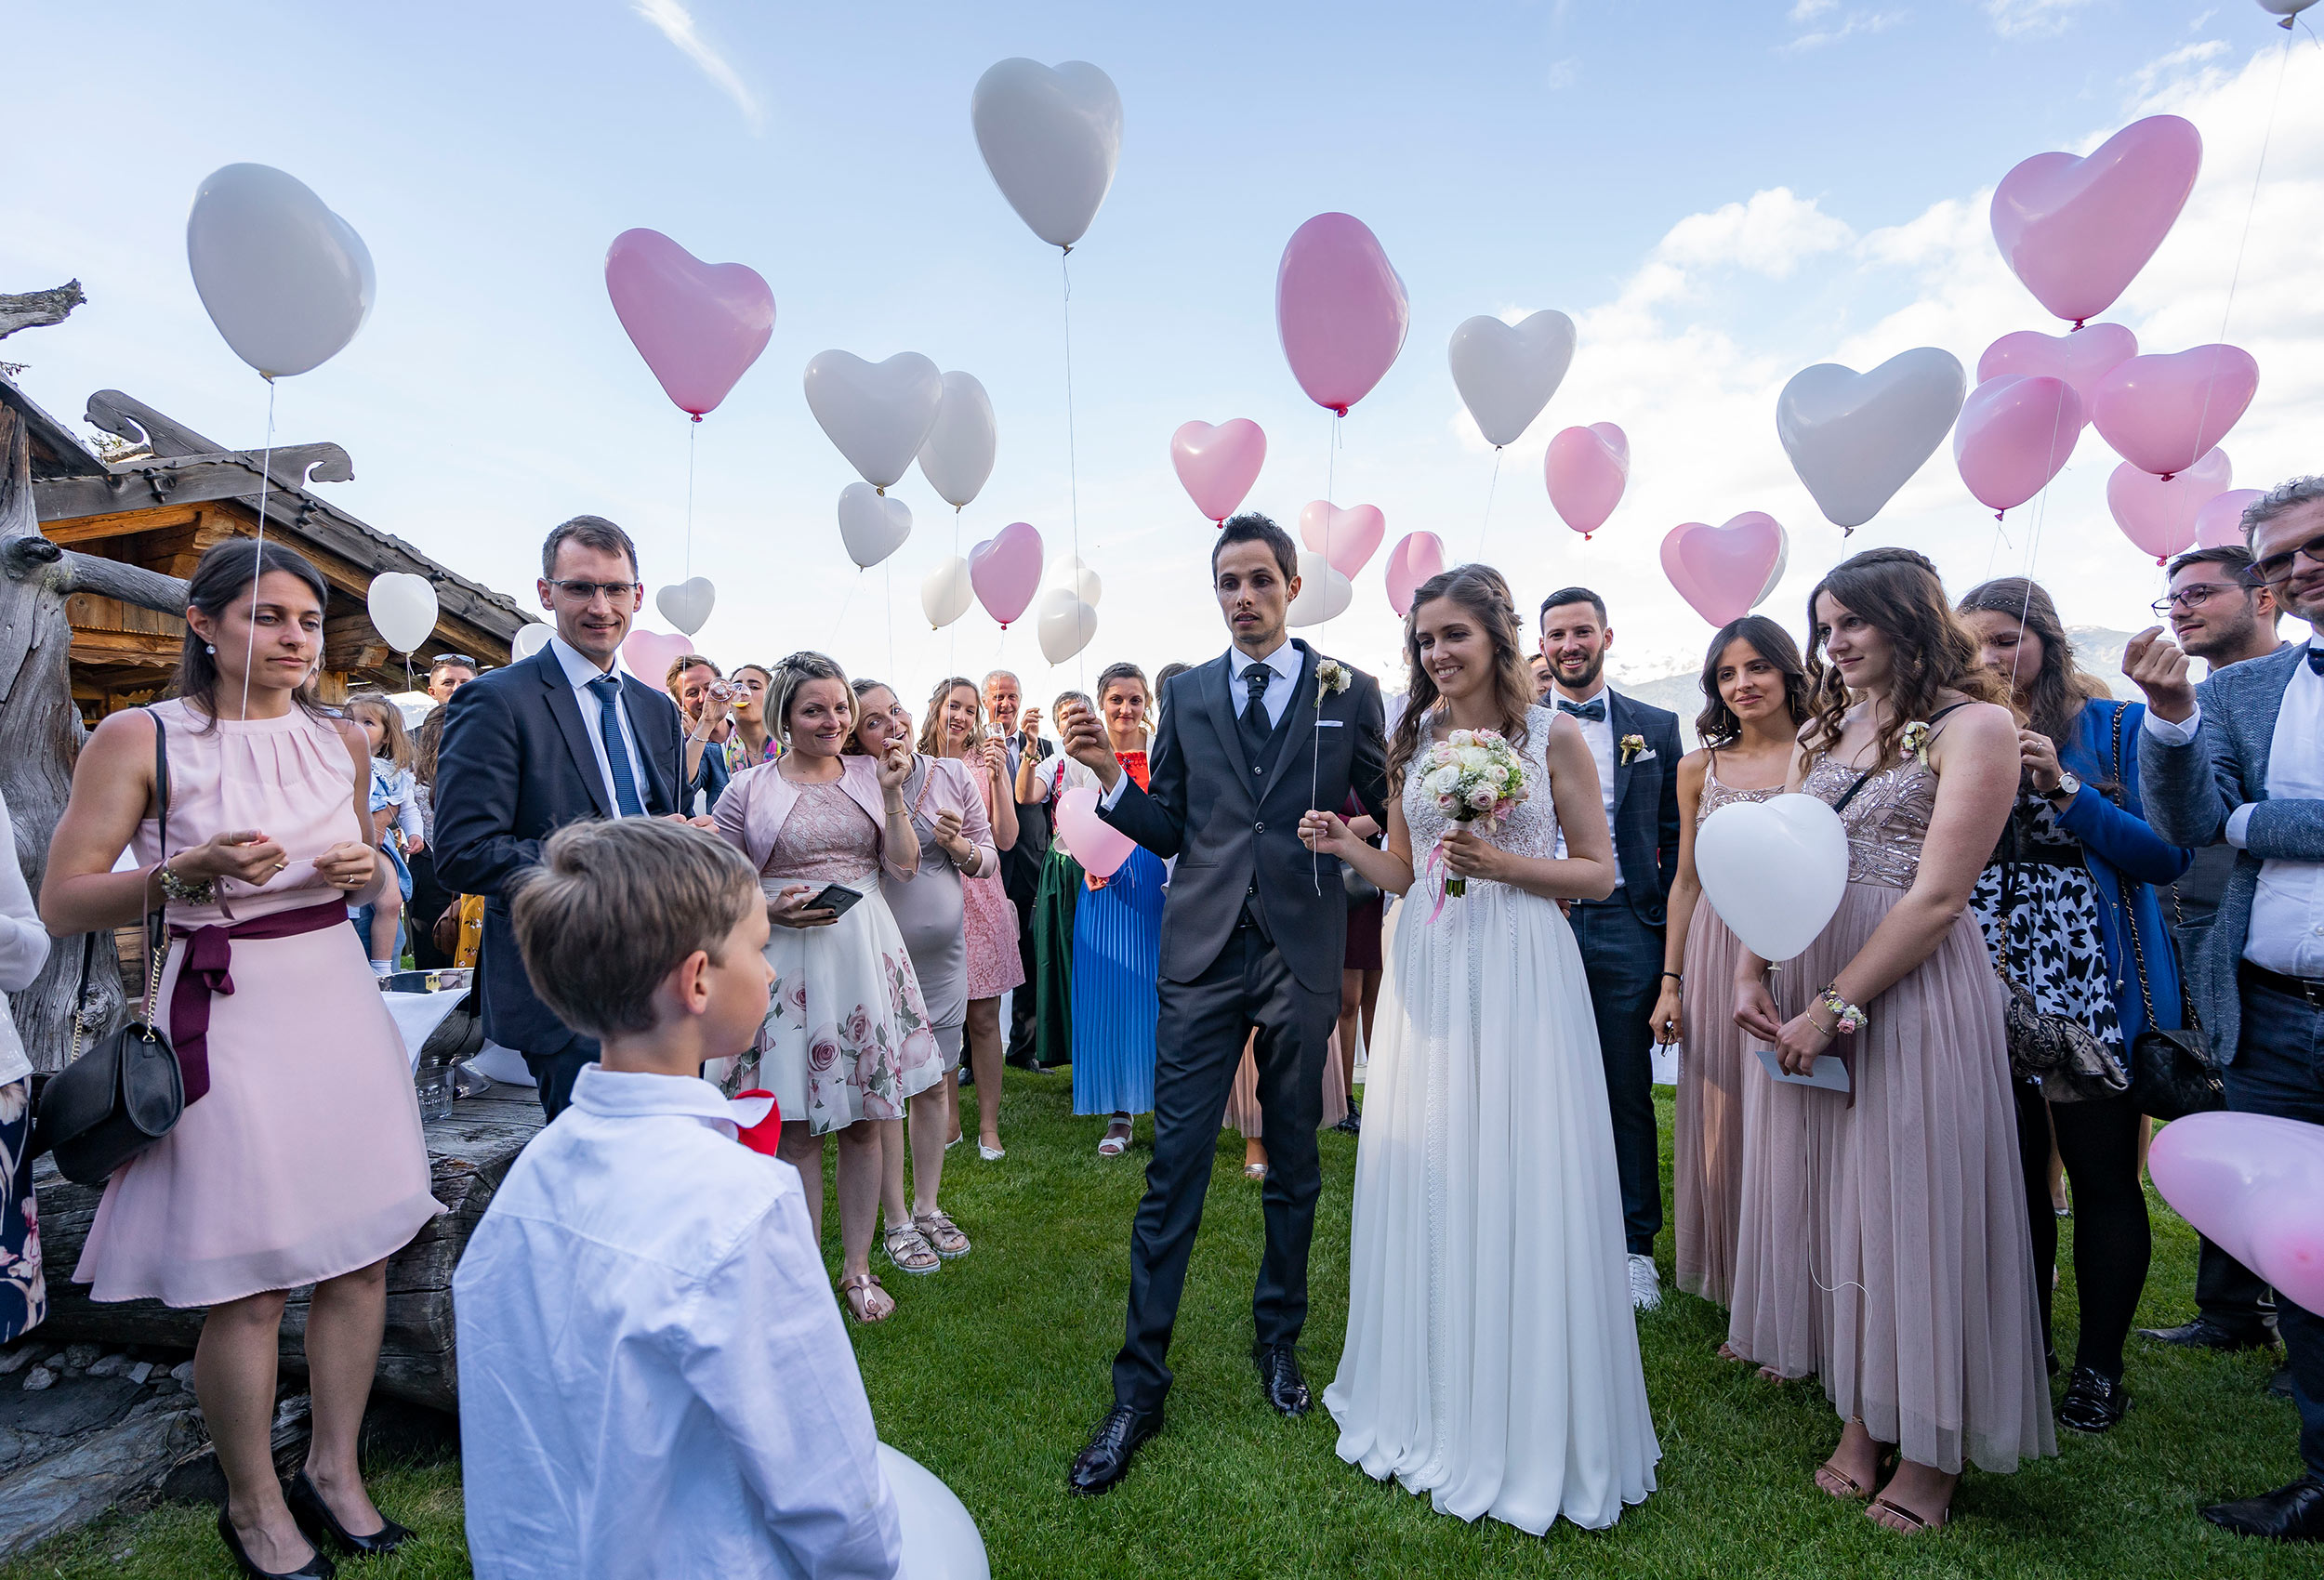 Evi_&_Christian_Hochzeit_01-06-2019_510